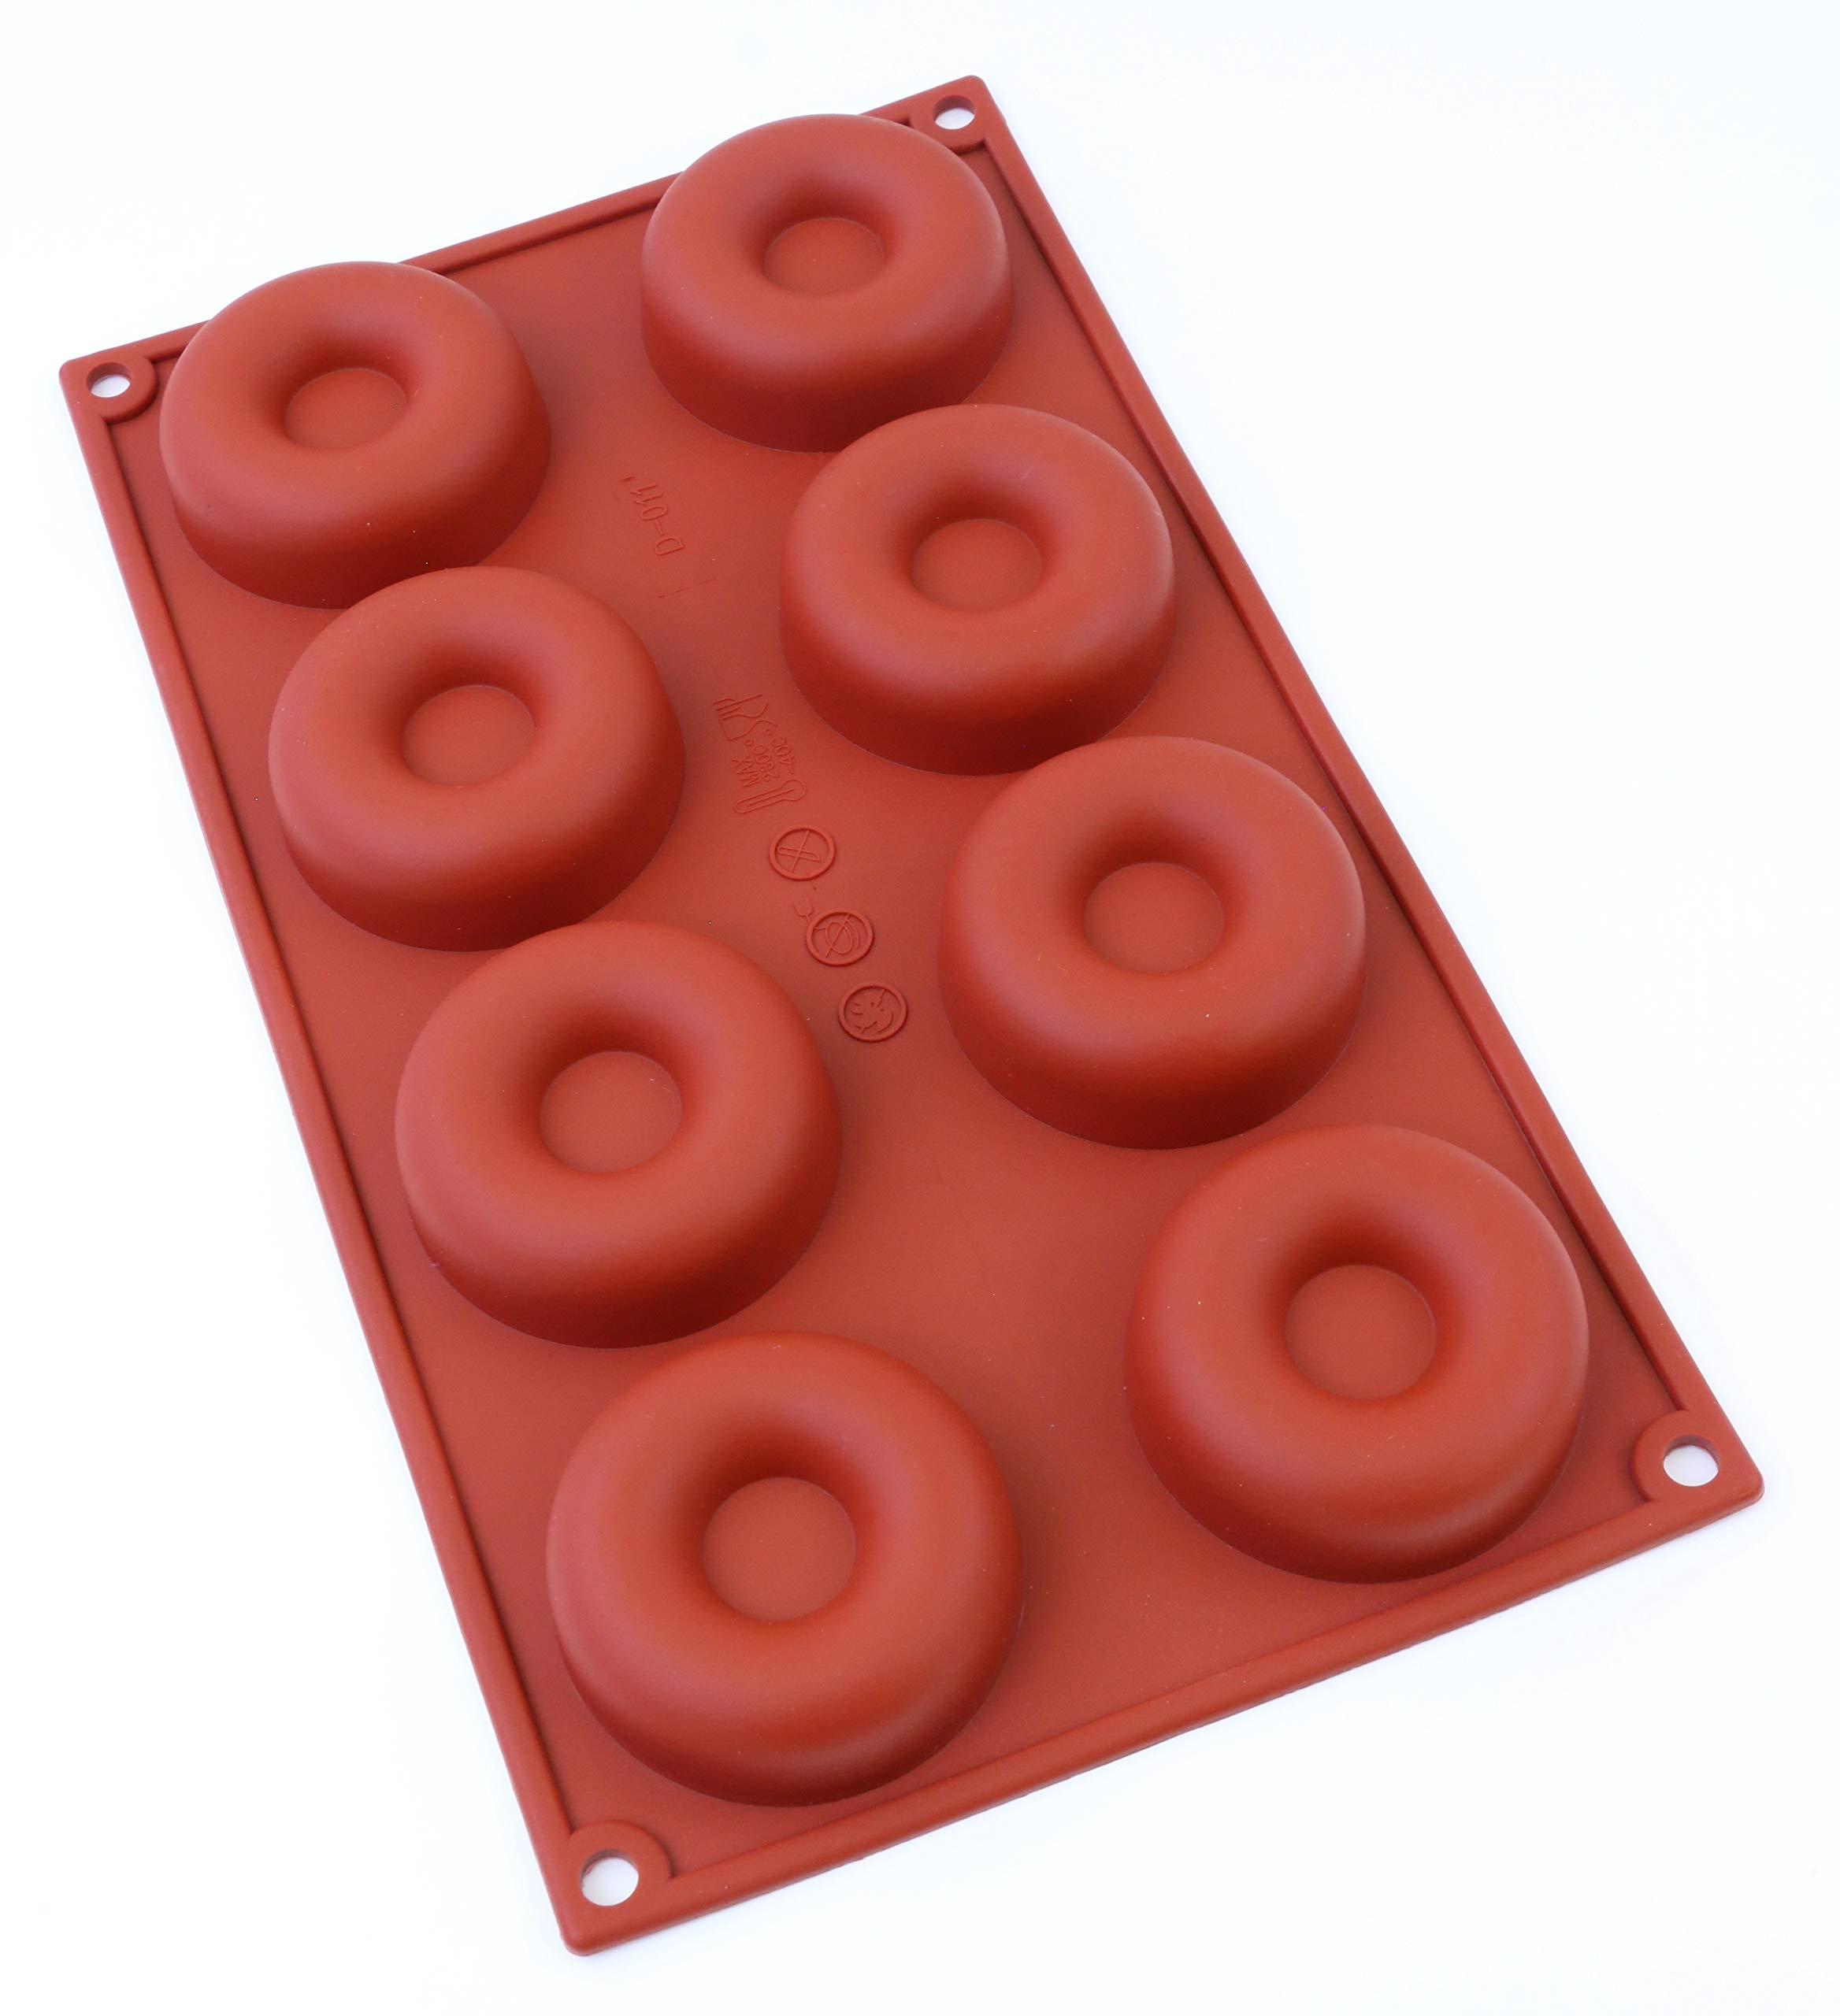 Oggibox 8-Cavity Savarin Silicone Mold for Donut/Cake/Bread/Cupcake/Cornbread Muffin Cups Donut Pan PACK OF 2 (2)